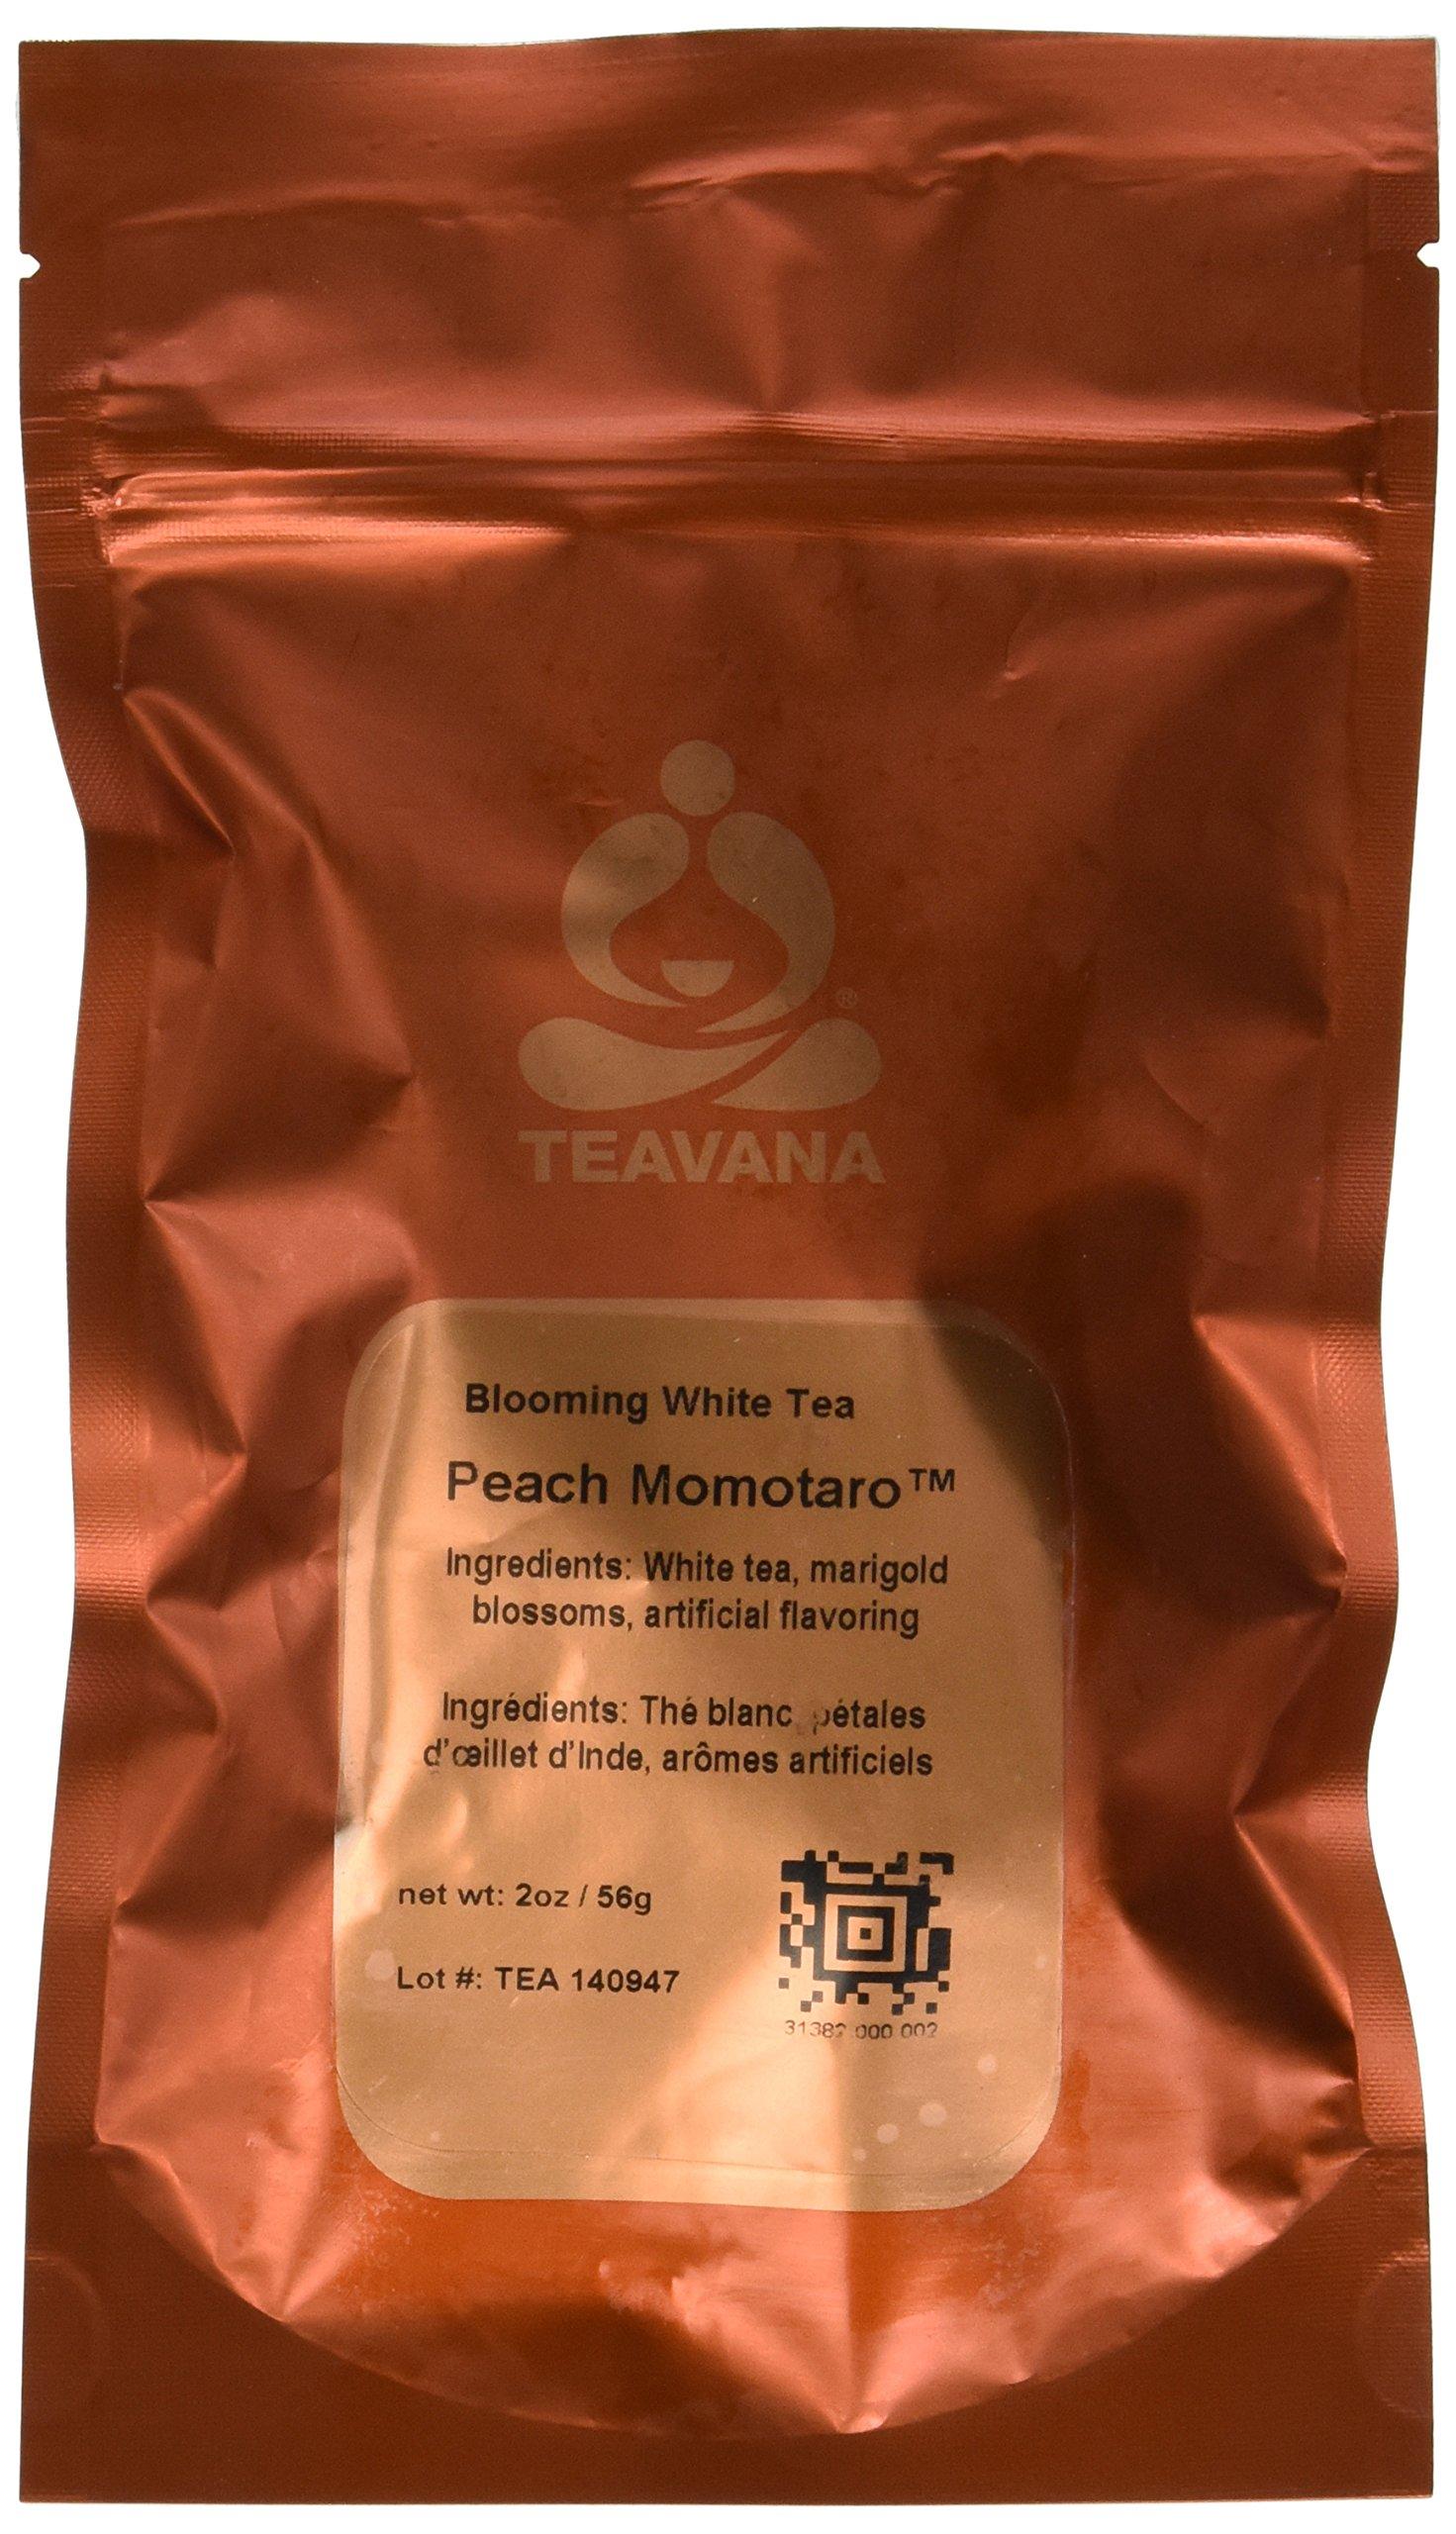 Teavana Peach Momotaro Blooming Flower Tea, 2oz by Teavana by Teavana